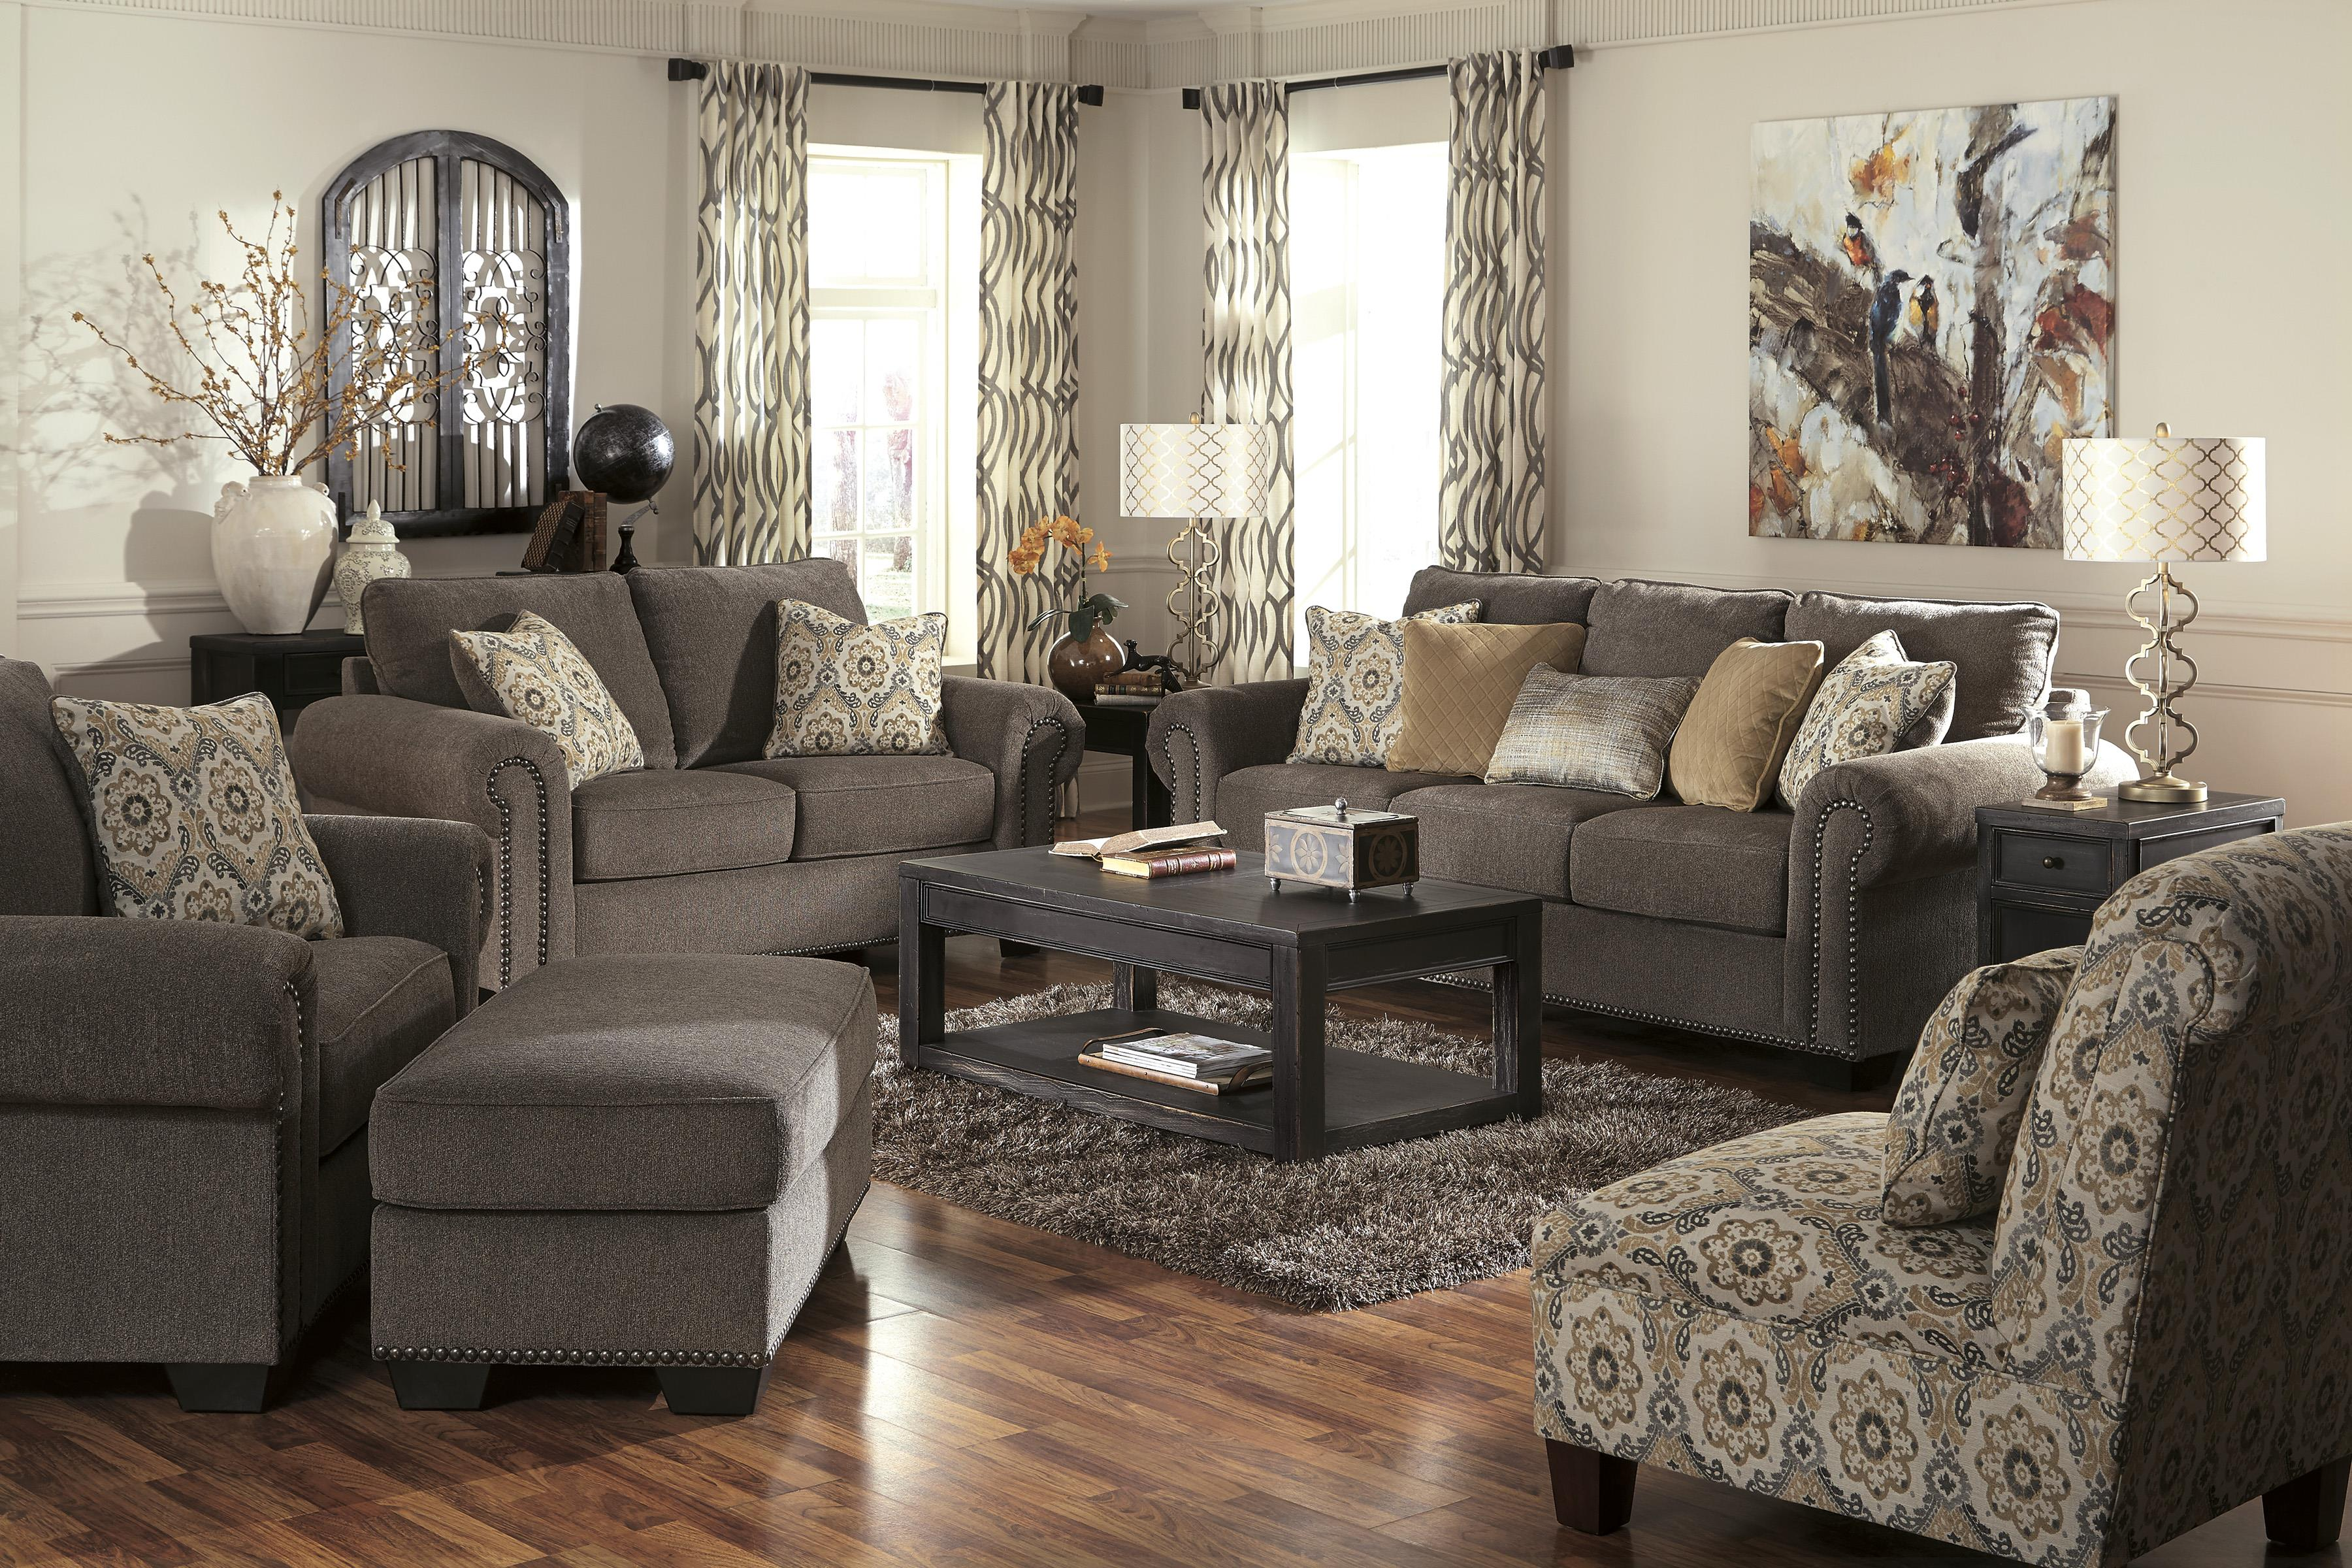 Benchcraft Emelen Stationary Living Room Group - Item Number: 45600 Living Room Group 4